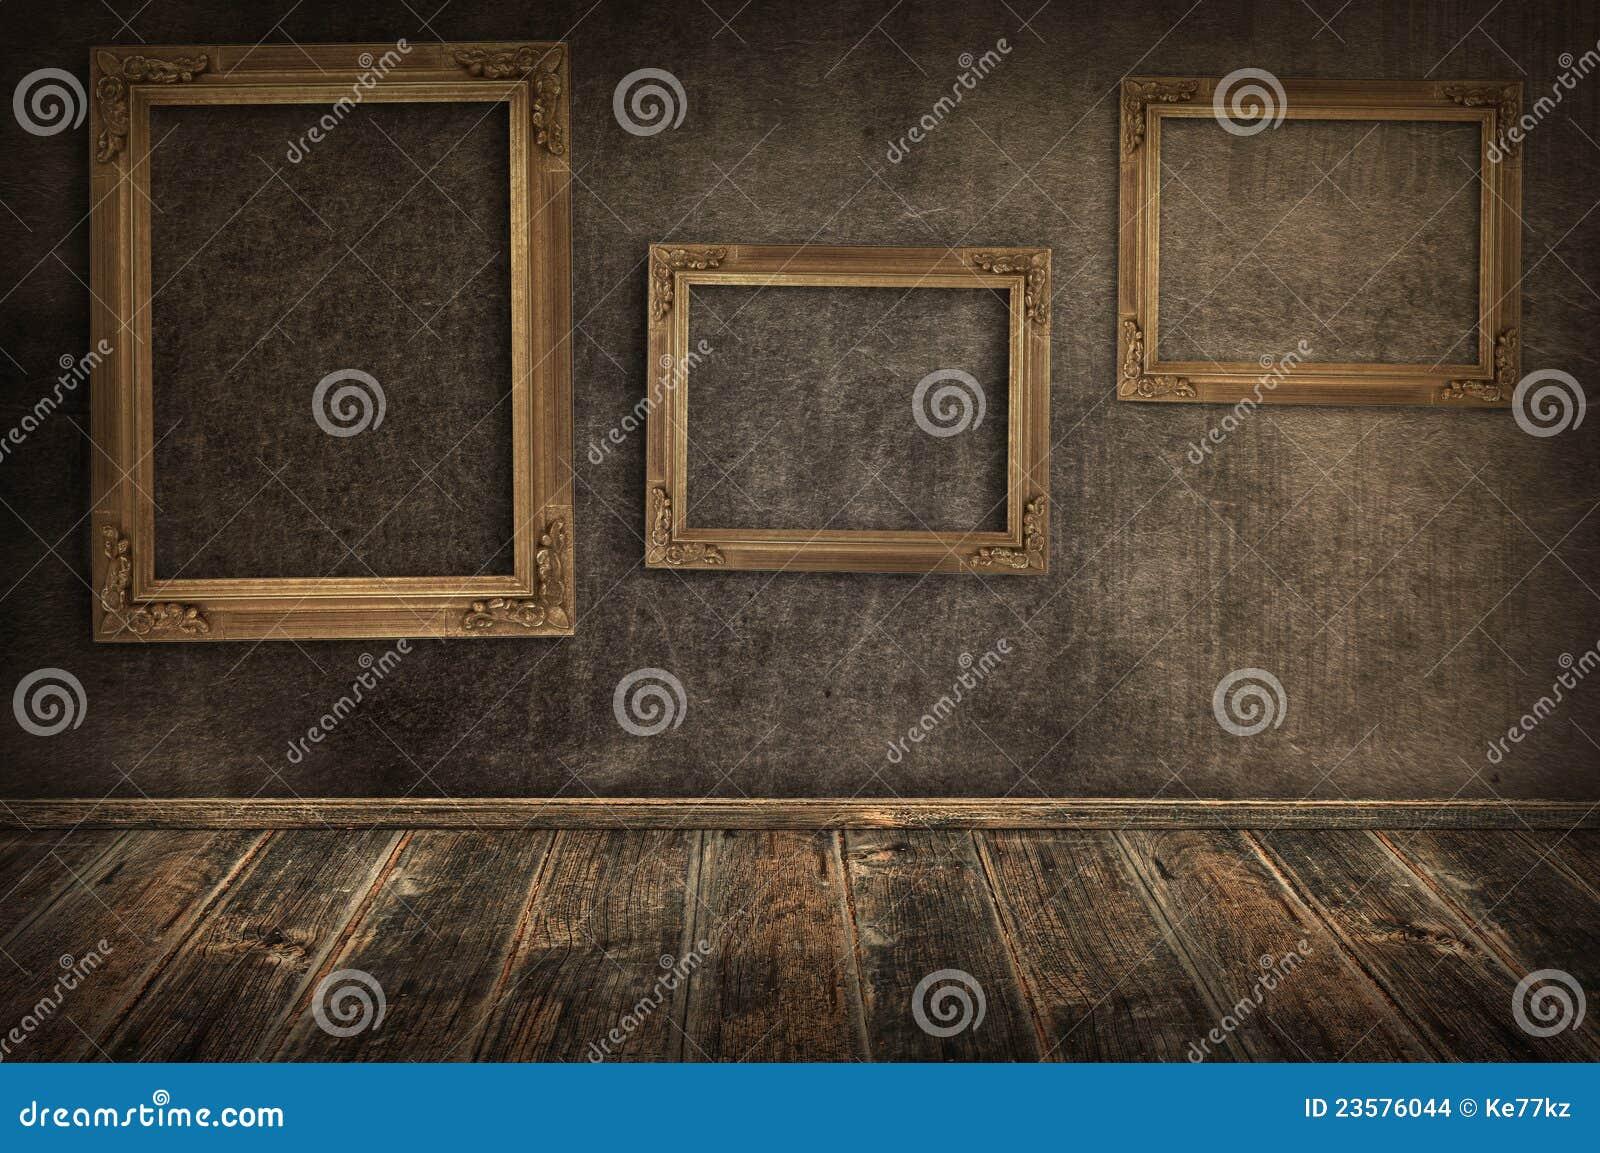 Tres marcos de la vendimia en la pared.